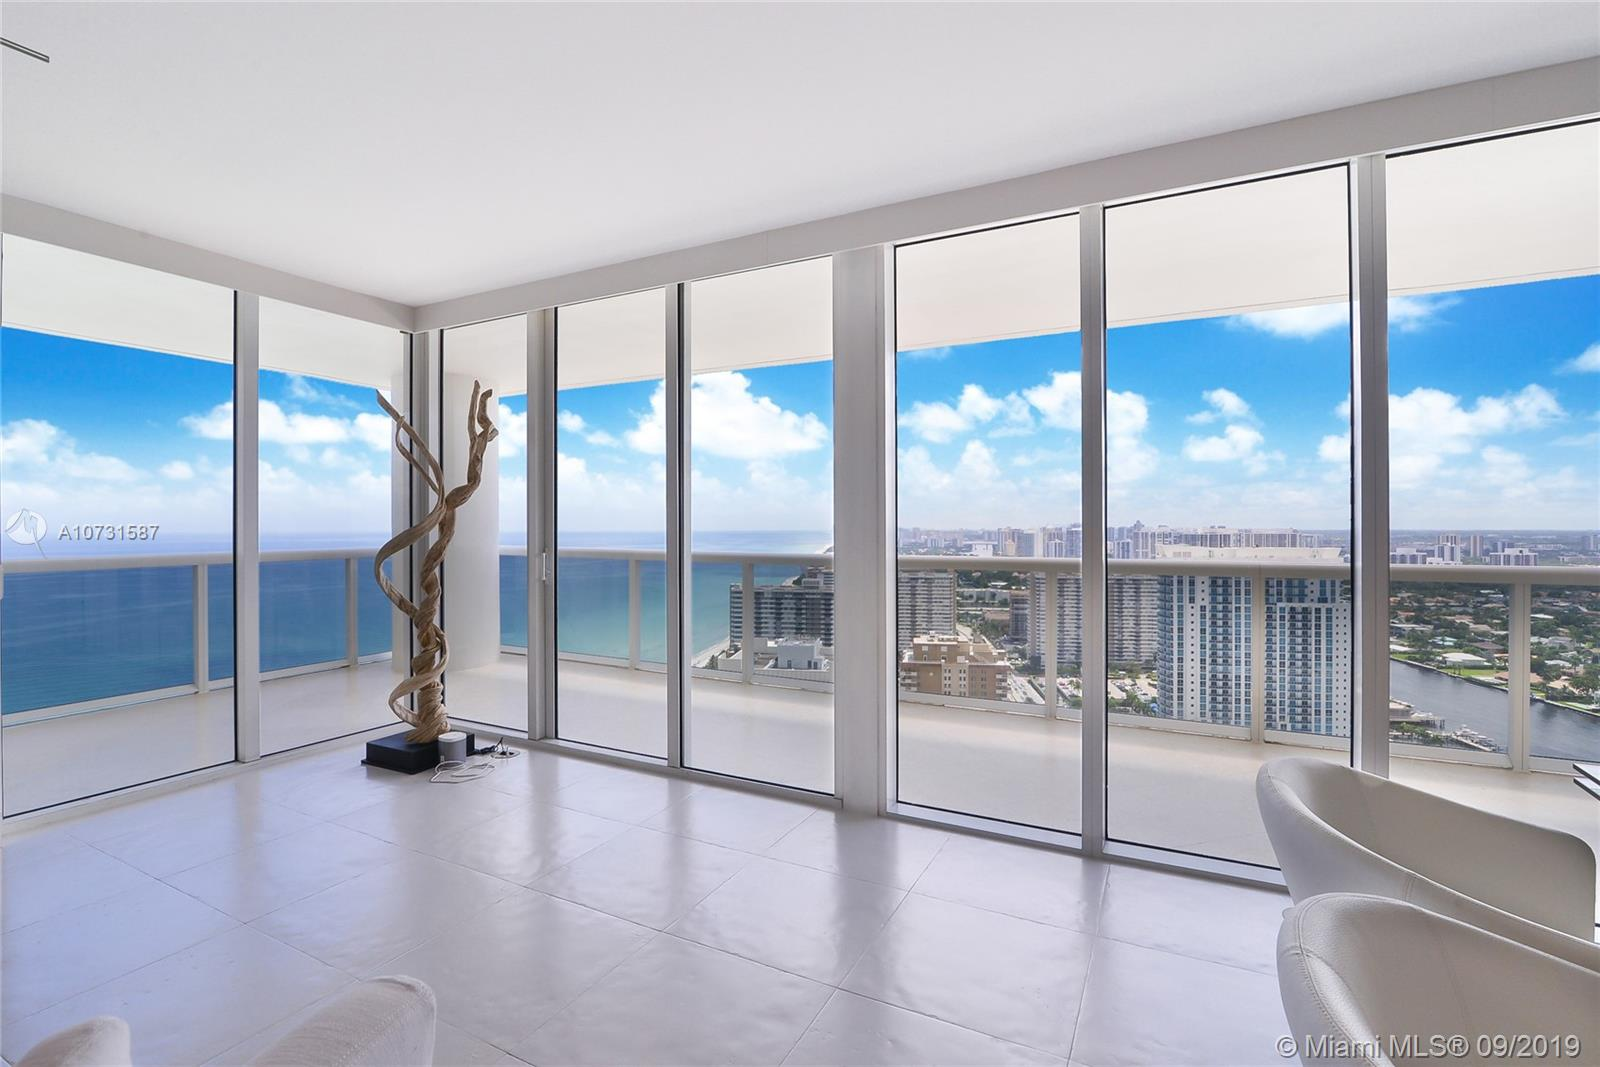 Beach Club Towers #3605 - 01 - photo